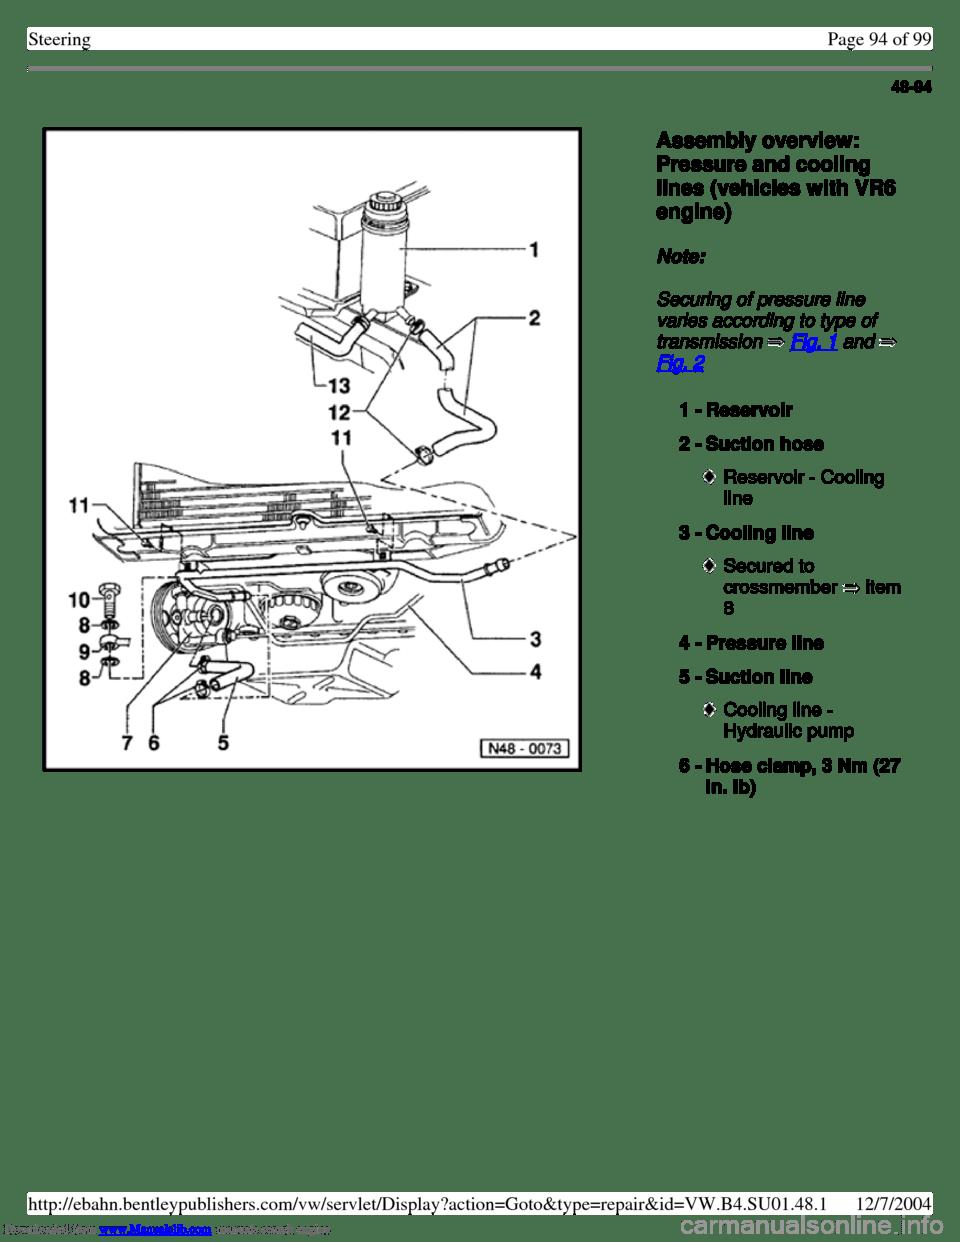 medium resolution of 1996 vr6 engine diagram